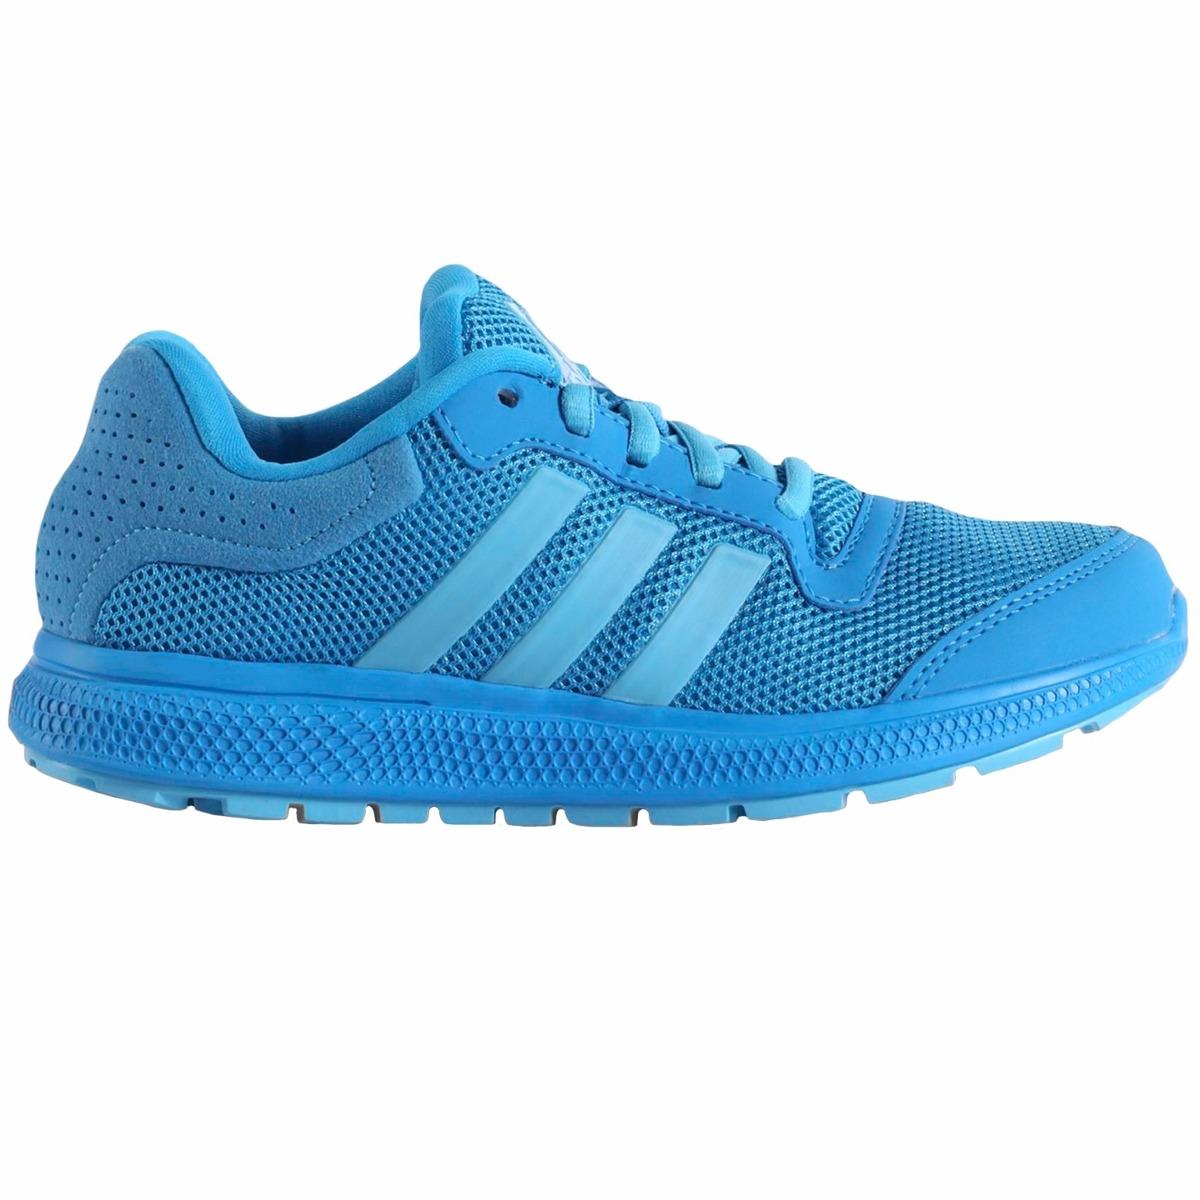 sports shoes 92227 aaf78 tenis atleticos energy bounce xj para niño adidas b24315. Cargando zoom.